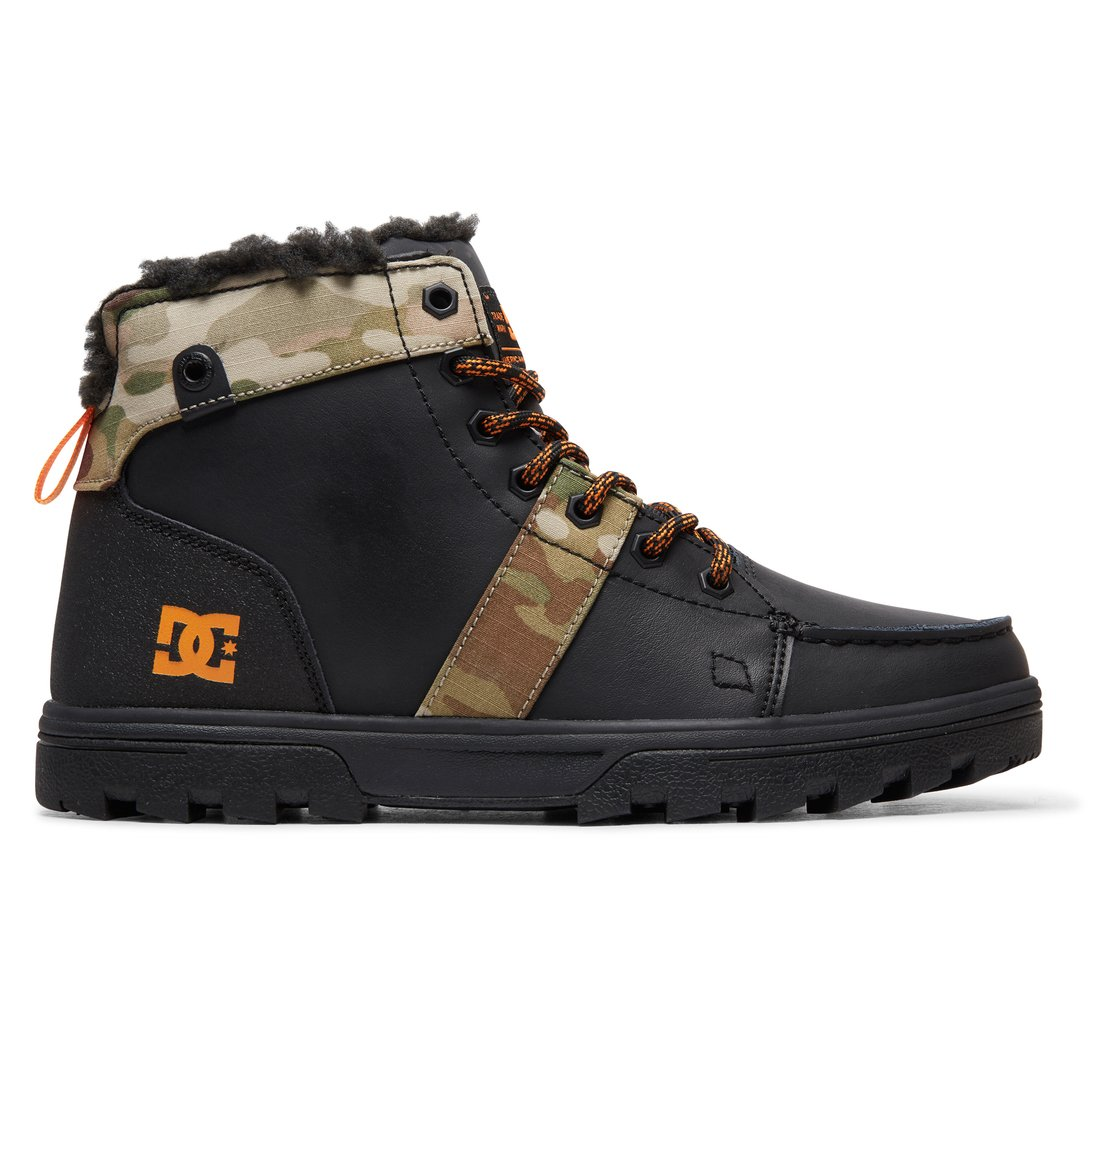 990577853 0 Woodland Lace-Up Boots Black 303241 DC Shoes